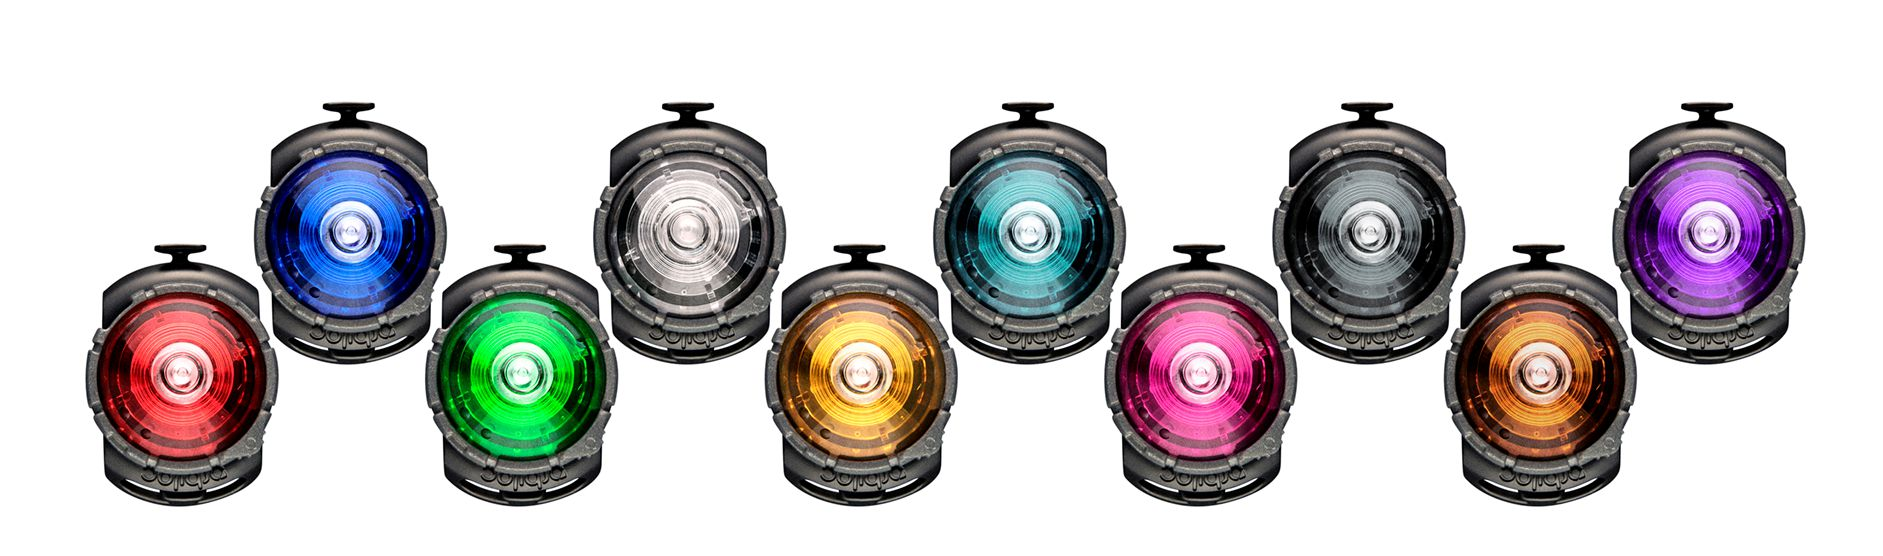 Farbubersicht-zugeschnittengmum6iIABcF1C